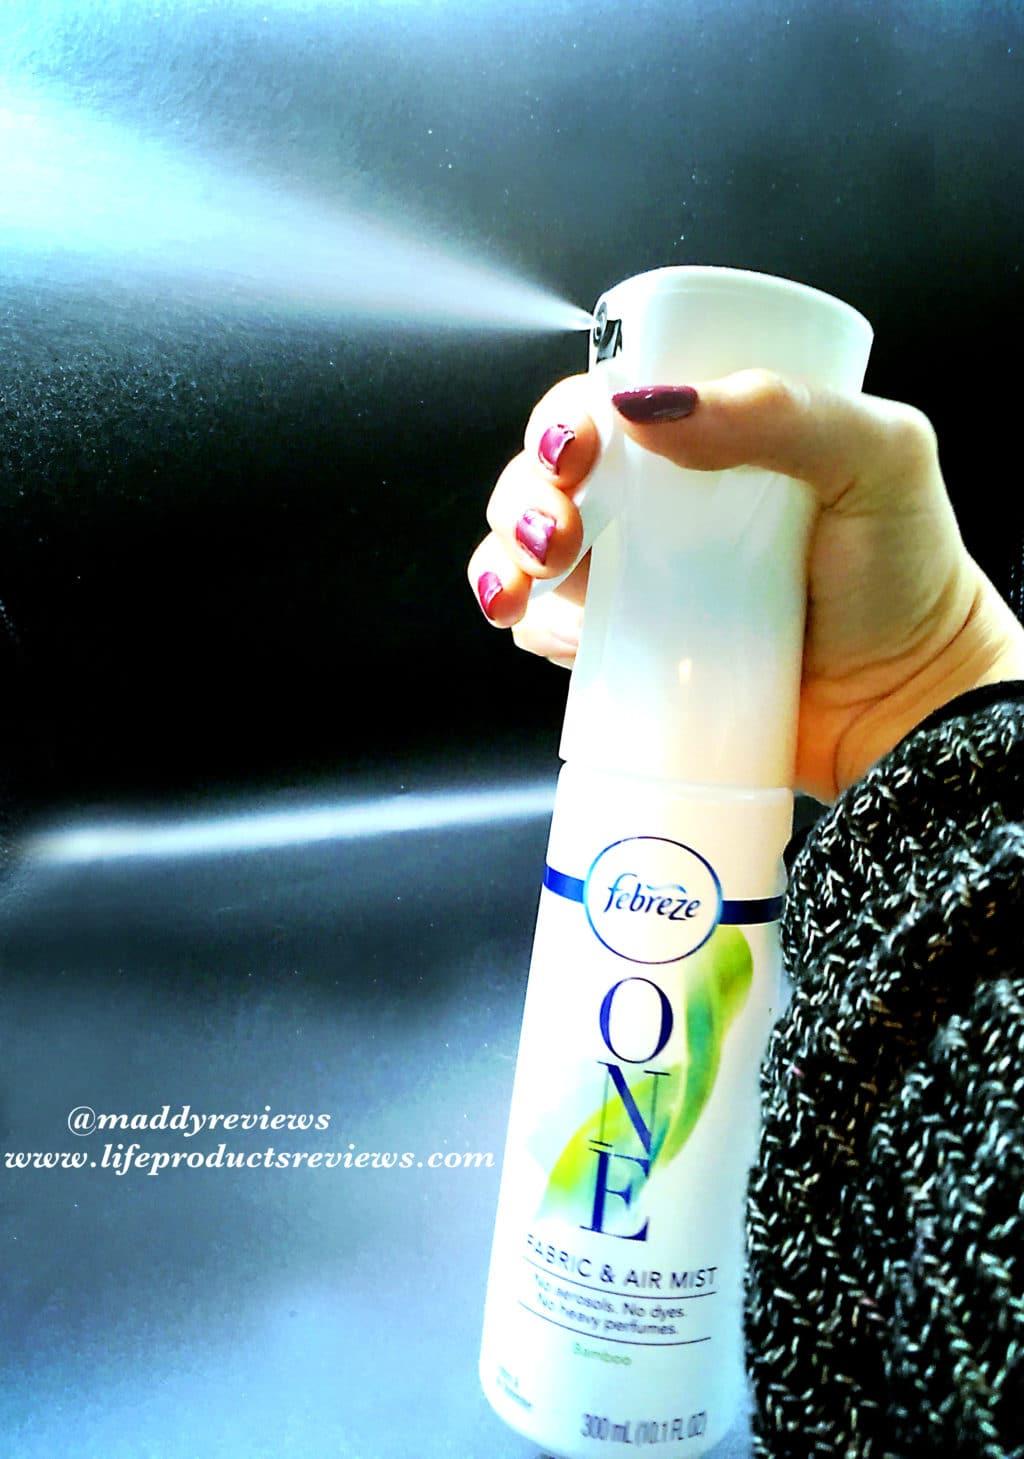 Febrezze-One-Fabric-air-mist-no-aerosols-no-dyes-no-heavy-perfumes